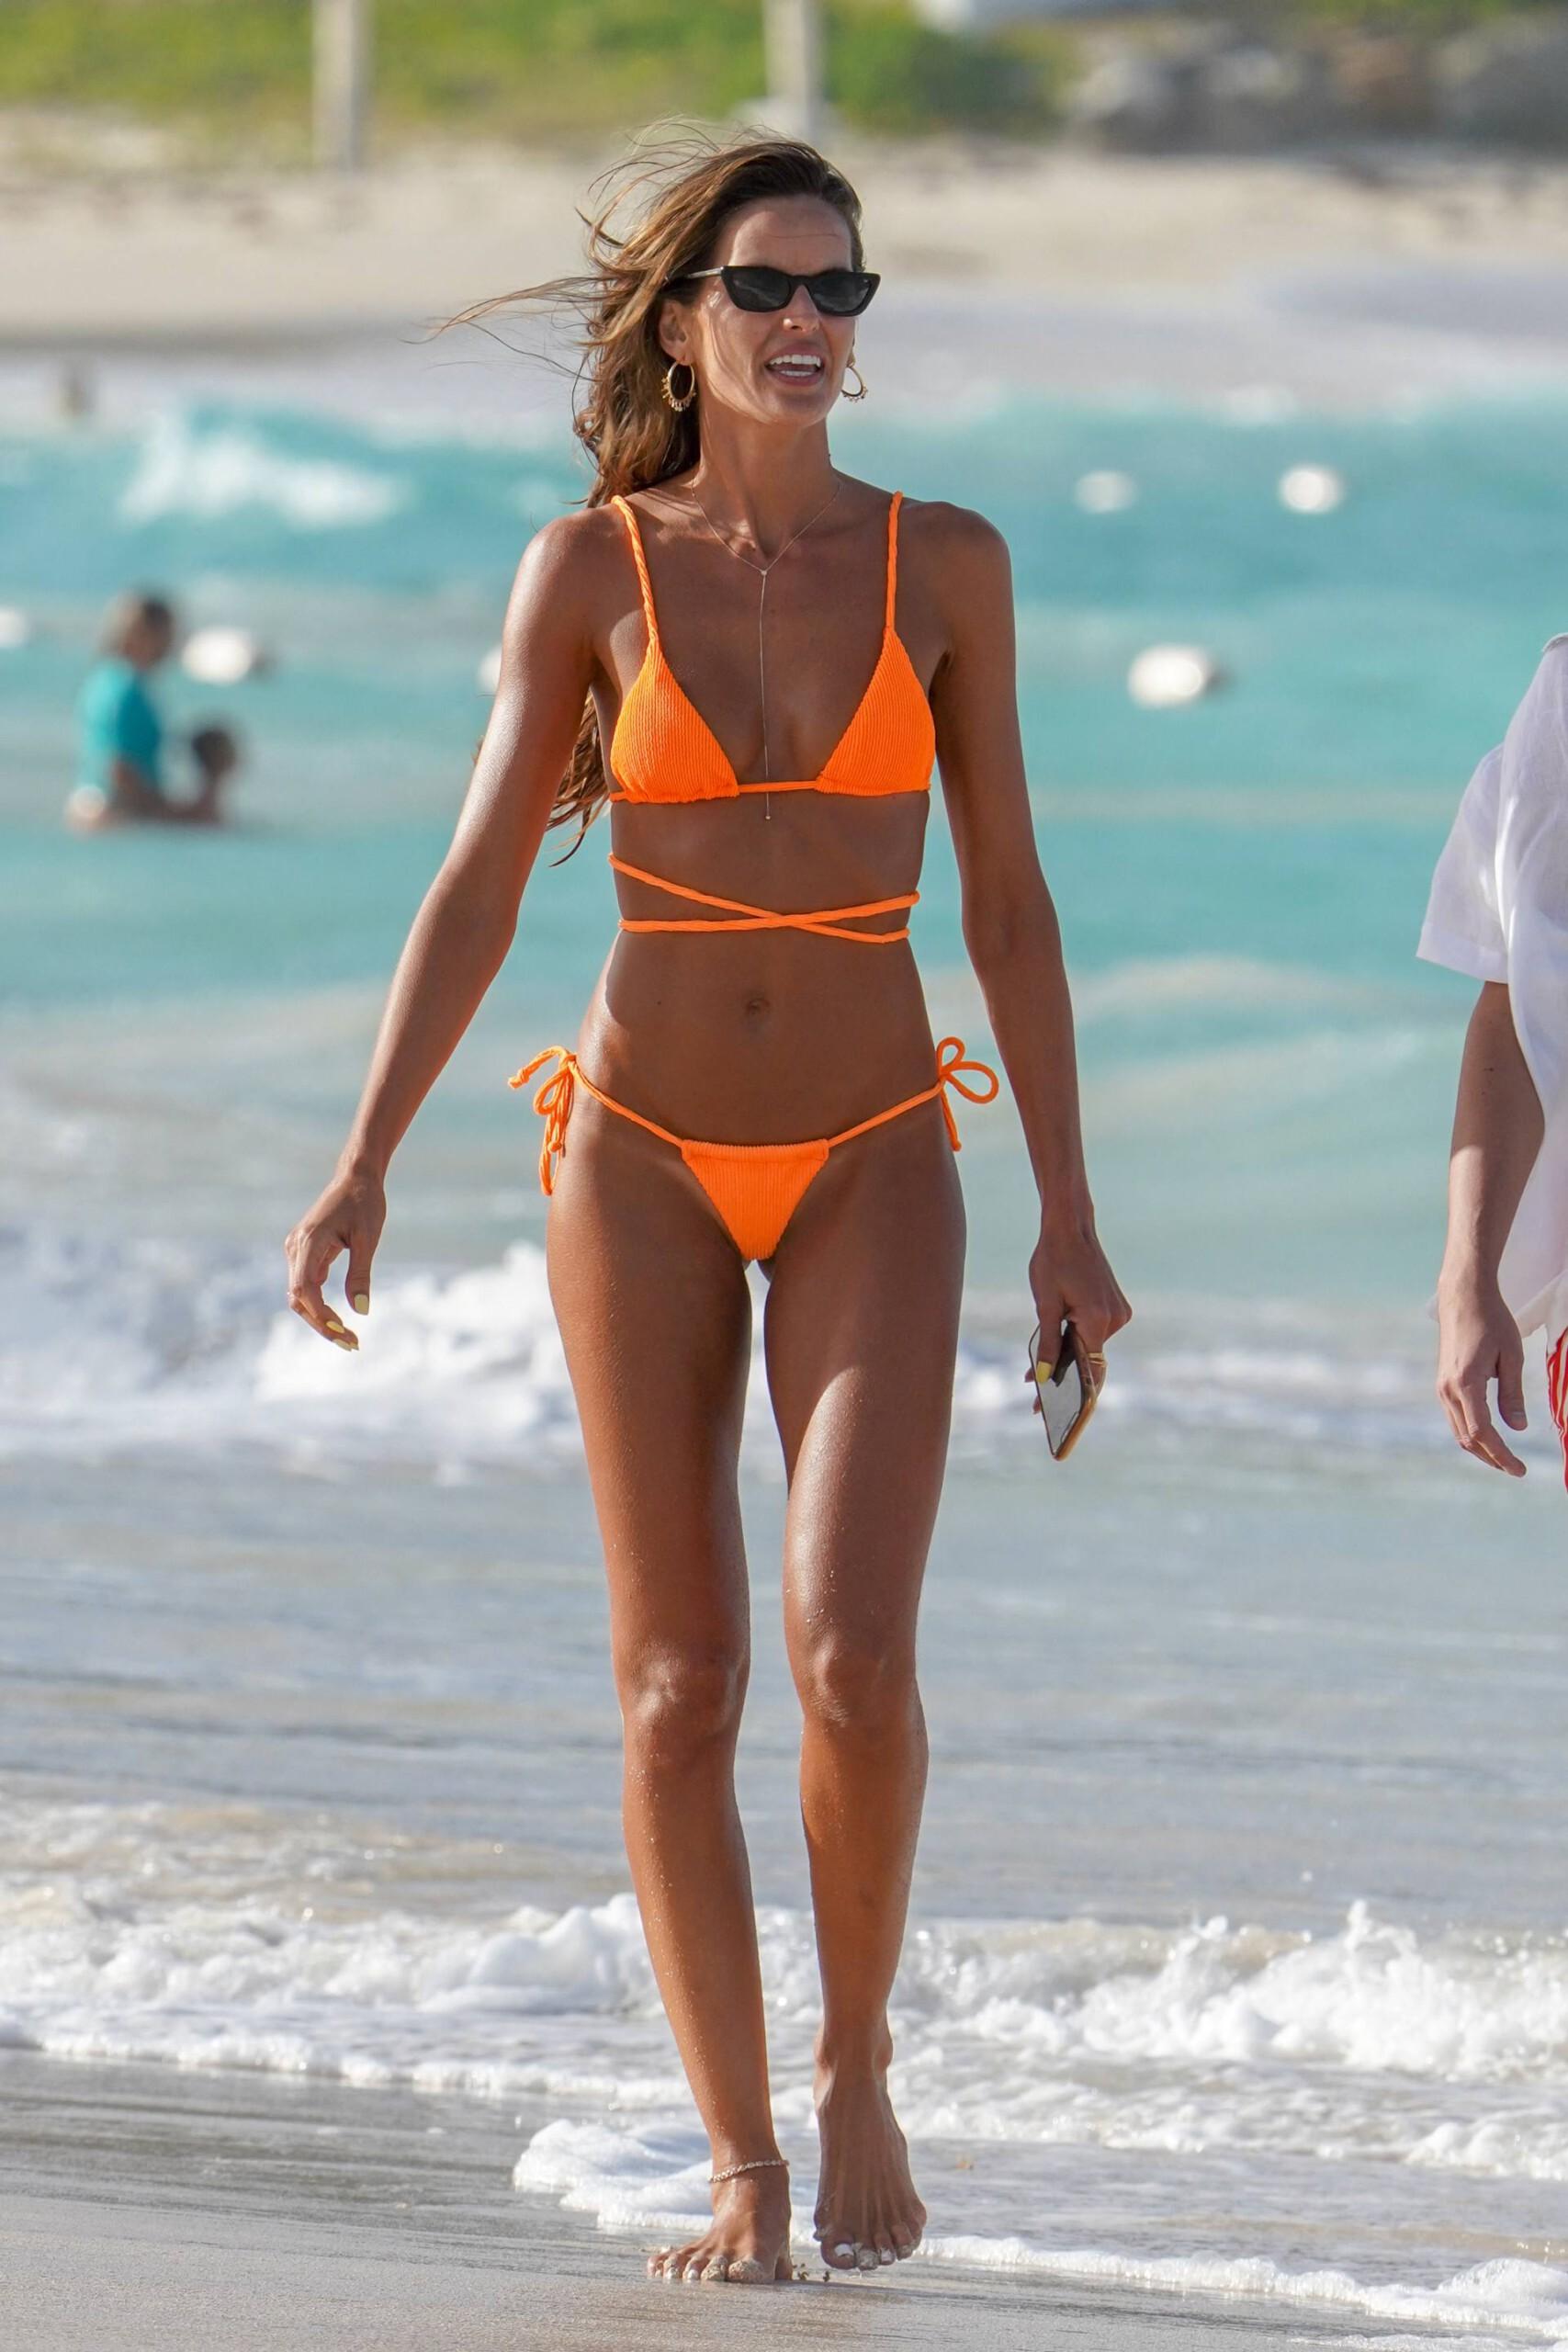 Izabel Goulart In Small Oragne Bikini